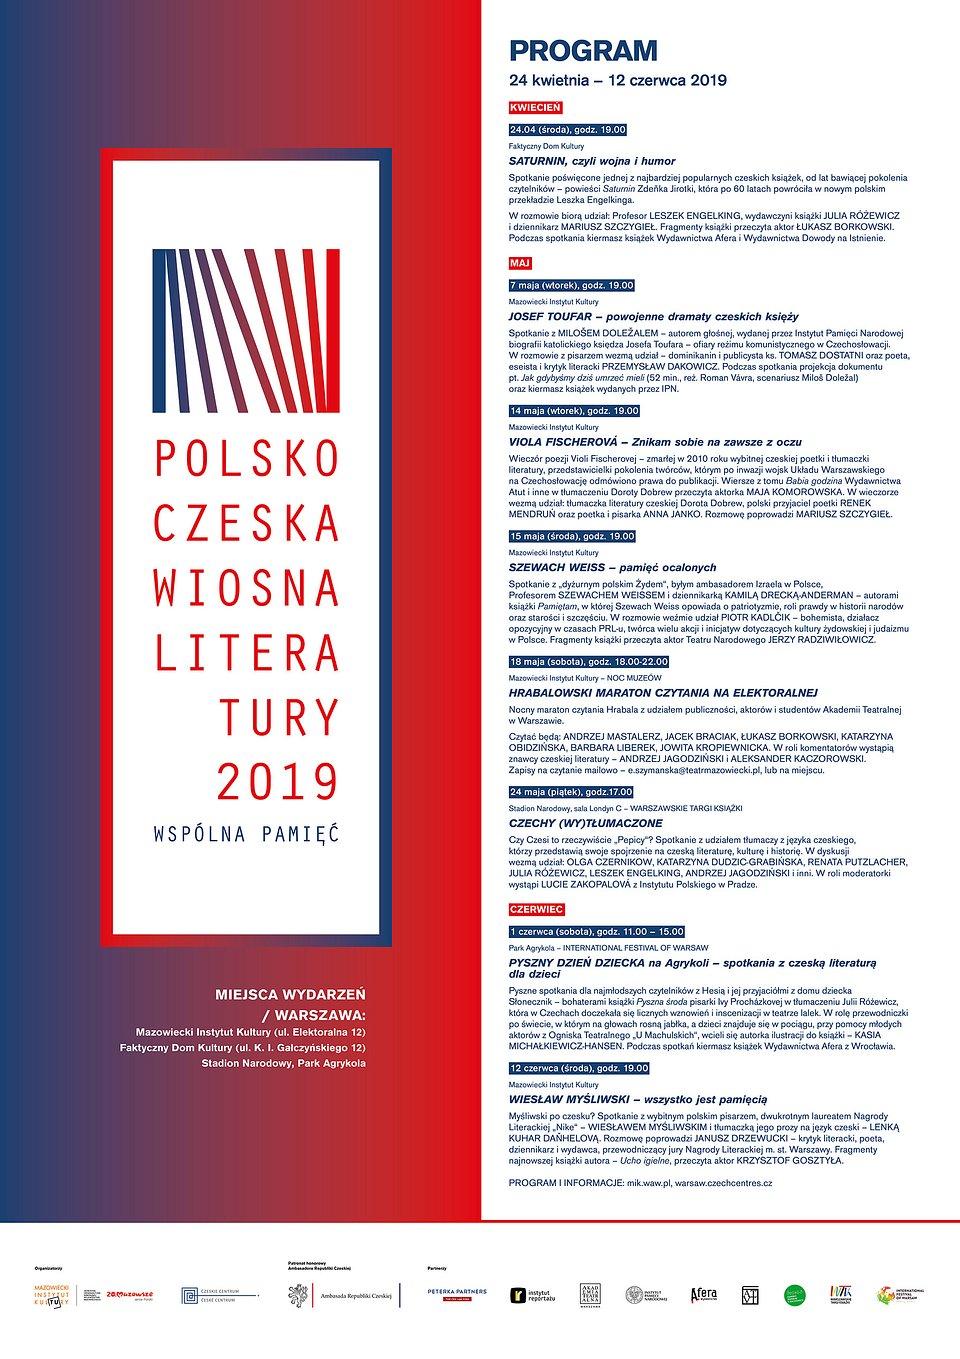 POLSKO-CZESKA WIOSNA LITERATURY 2019 PROGRAM.jpg